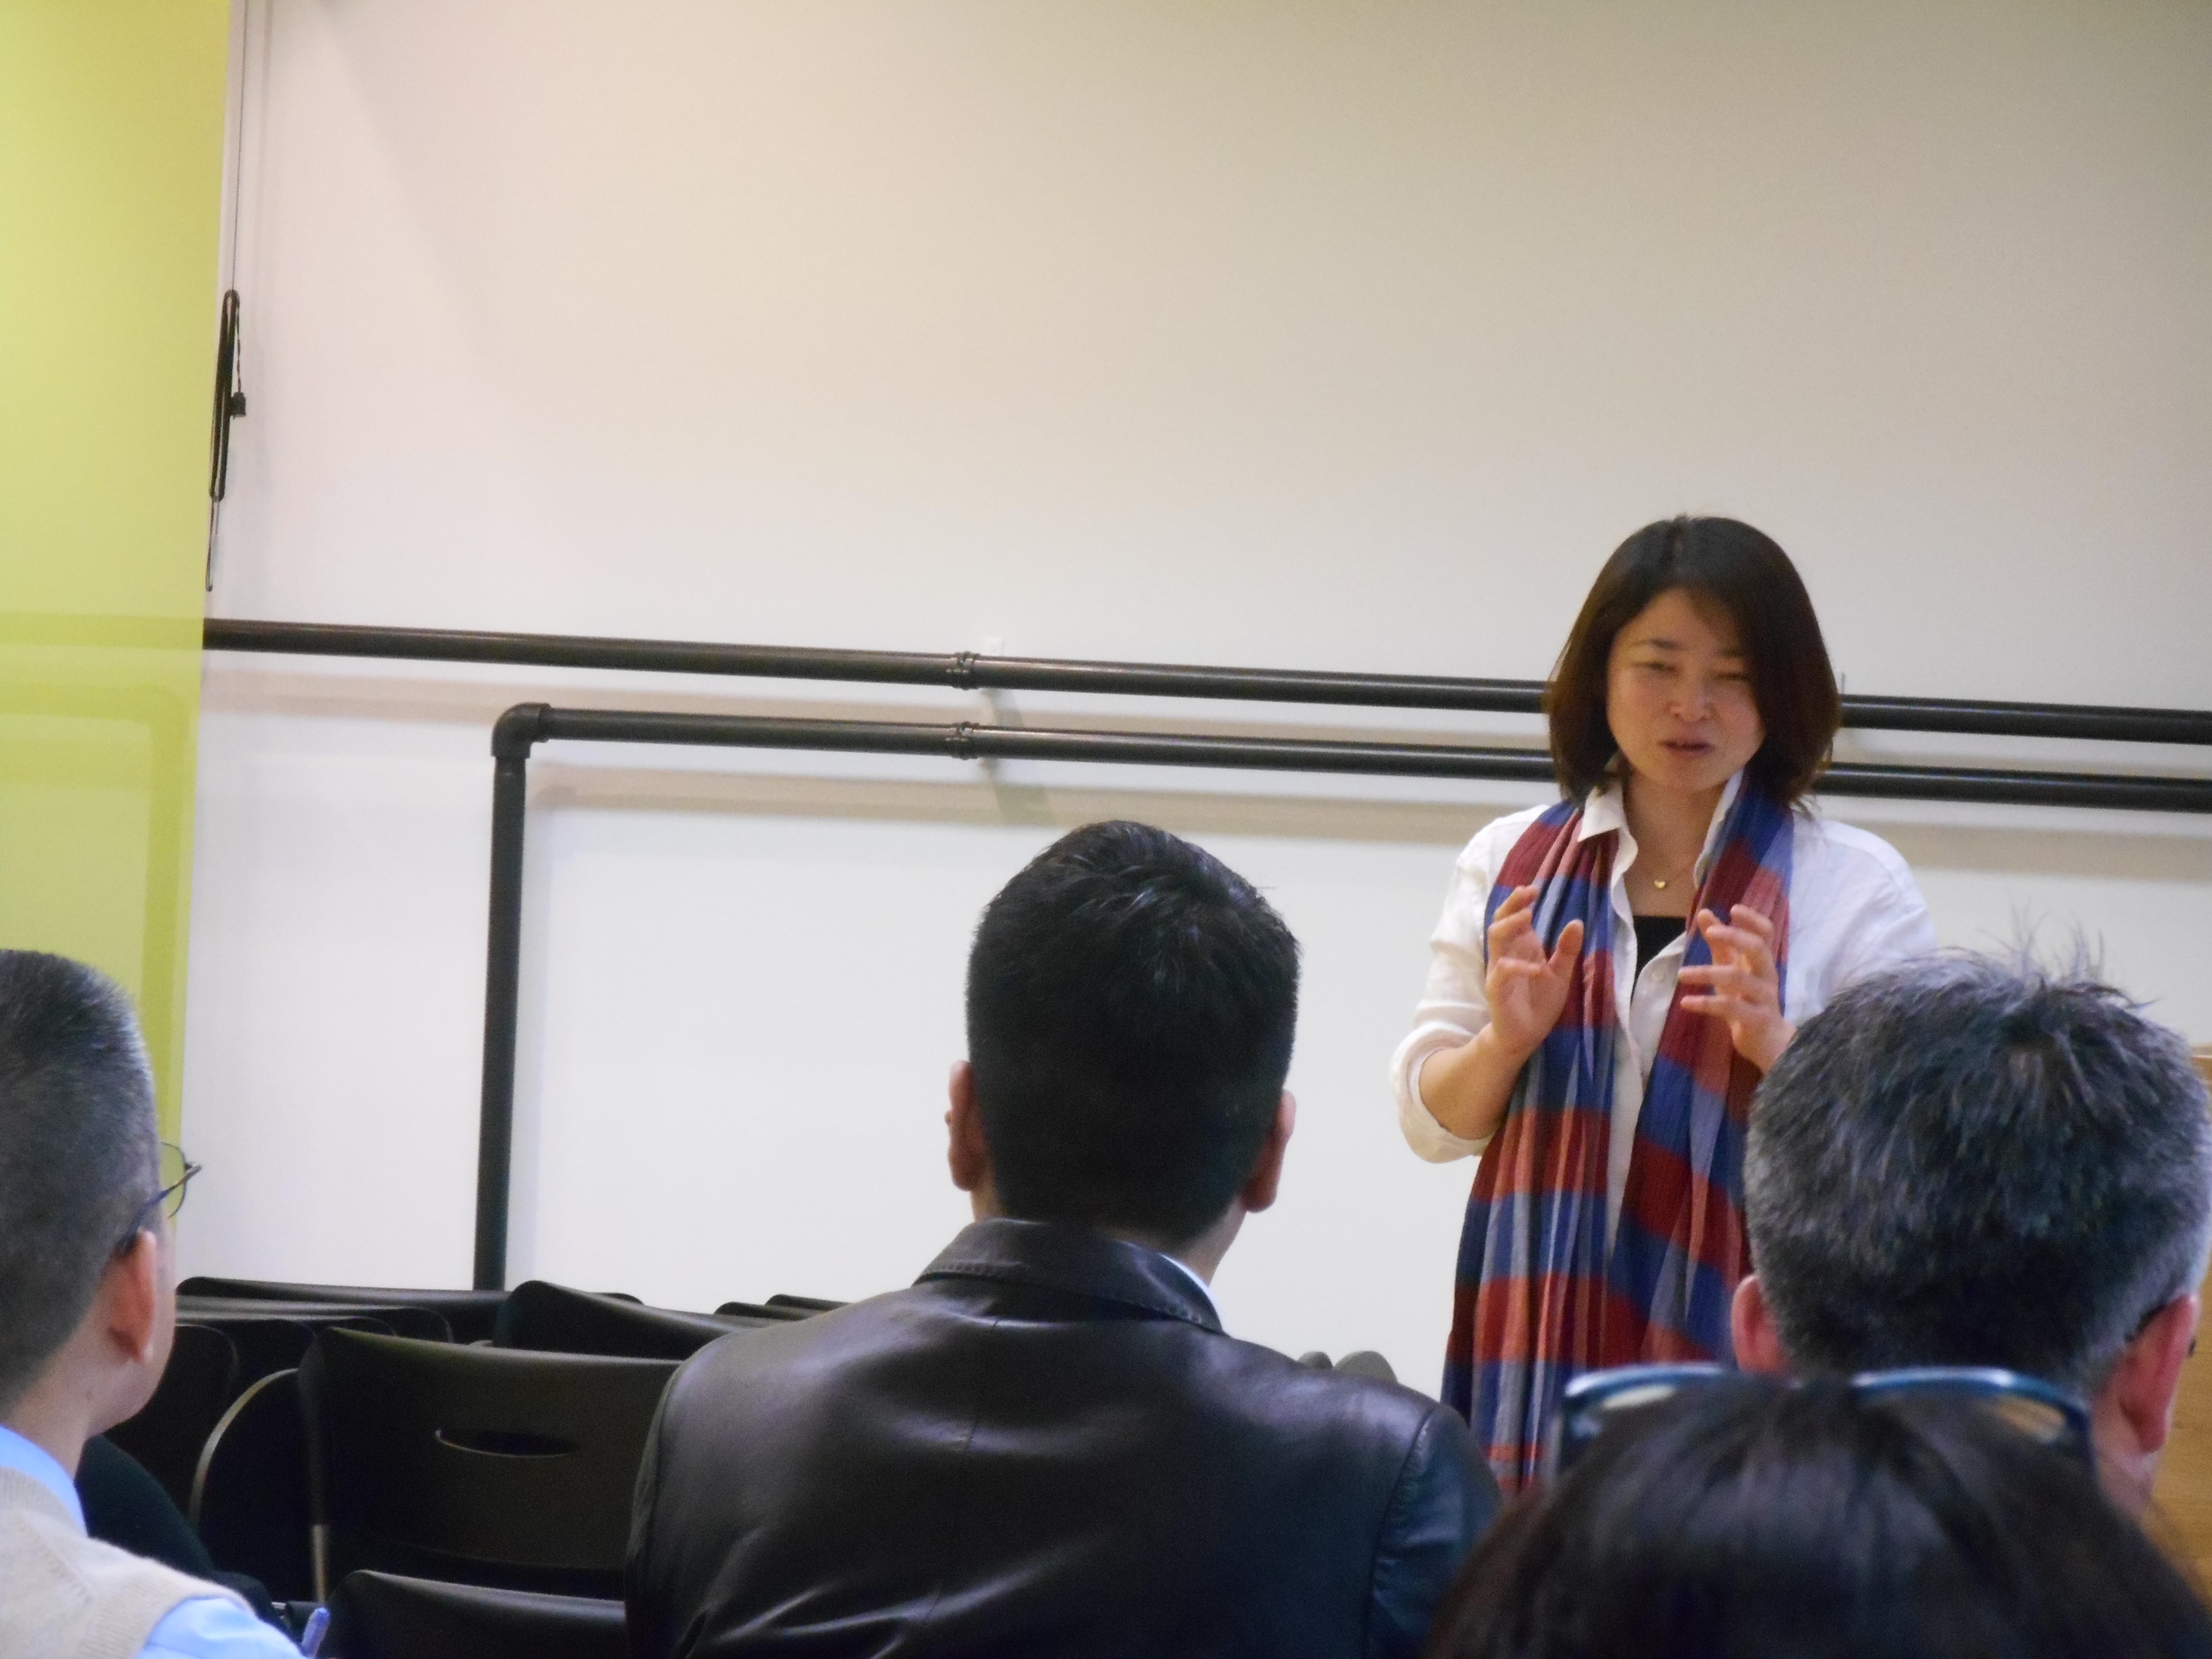 DSCN3724 1 - 4月1日東京思風塾の開催になります。